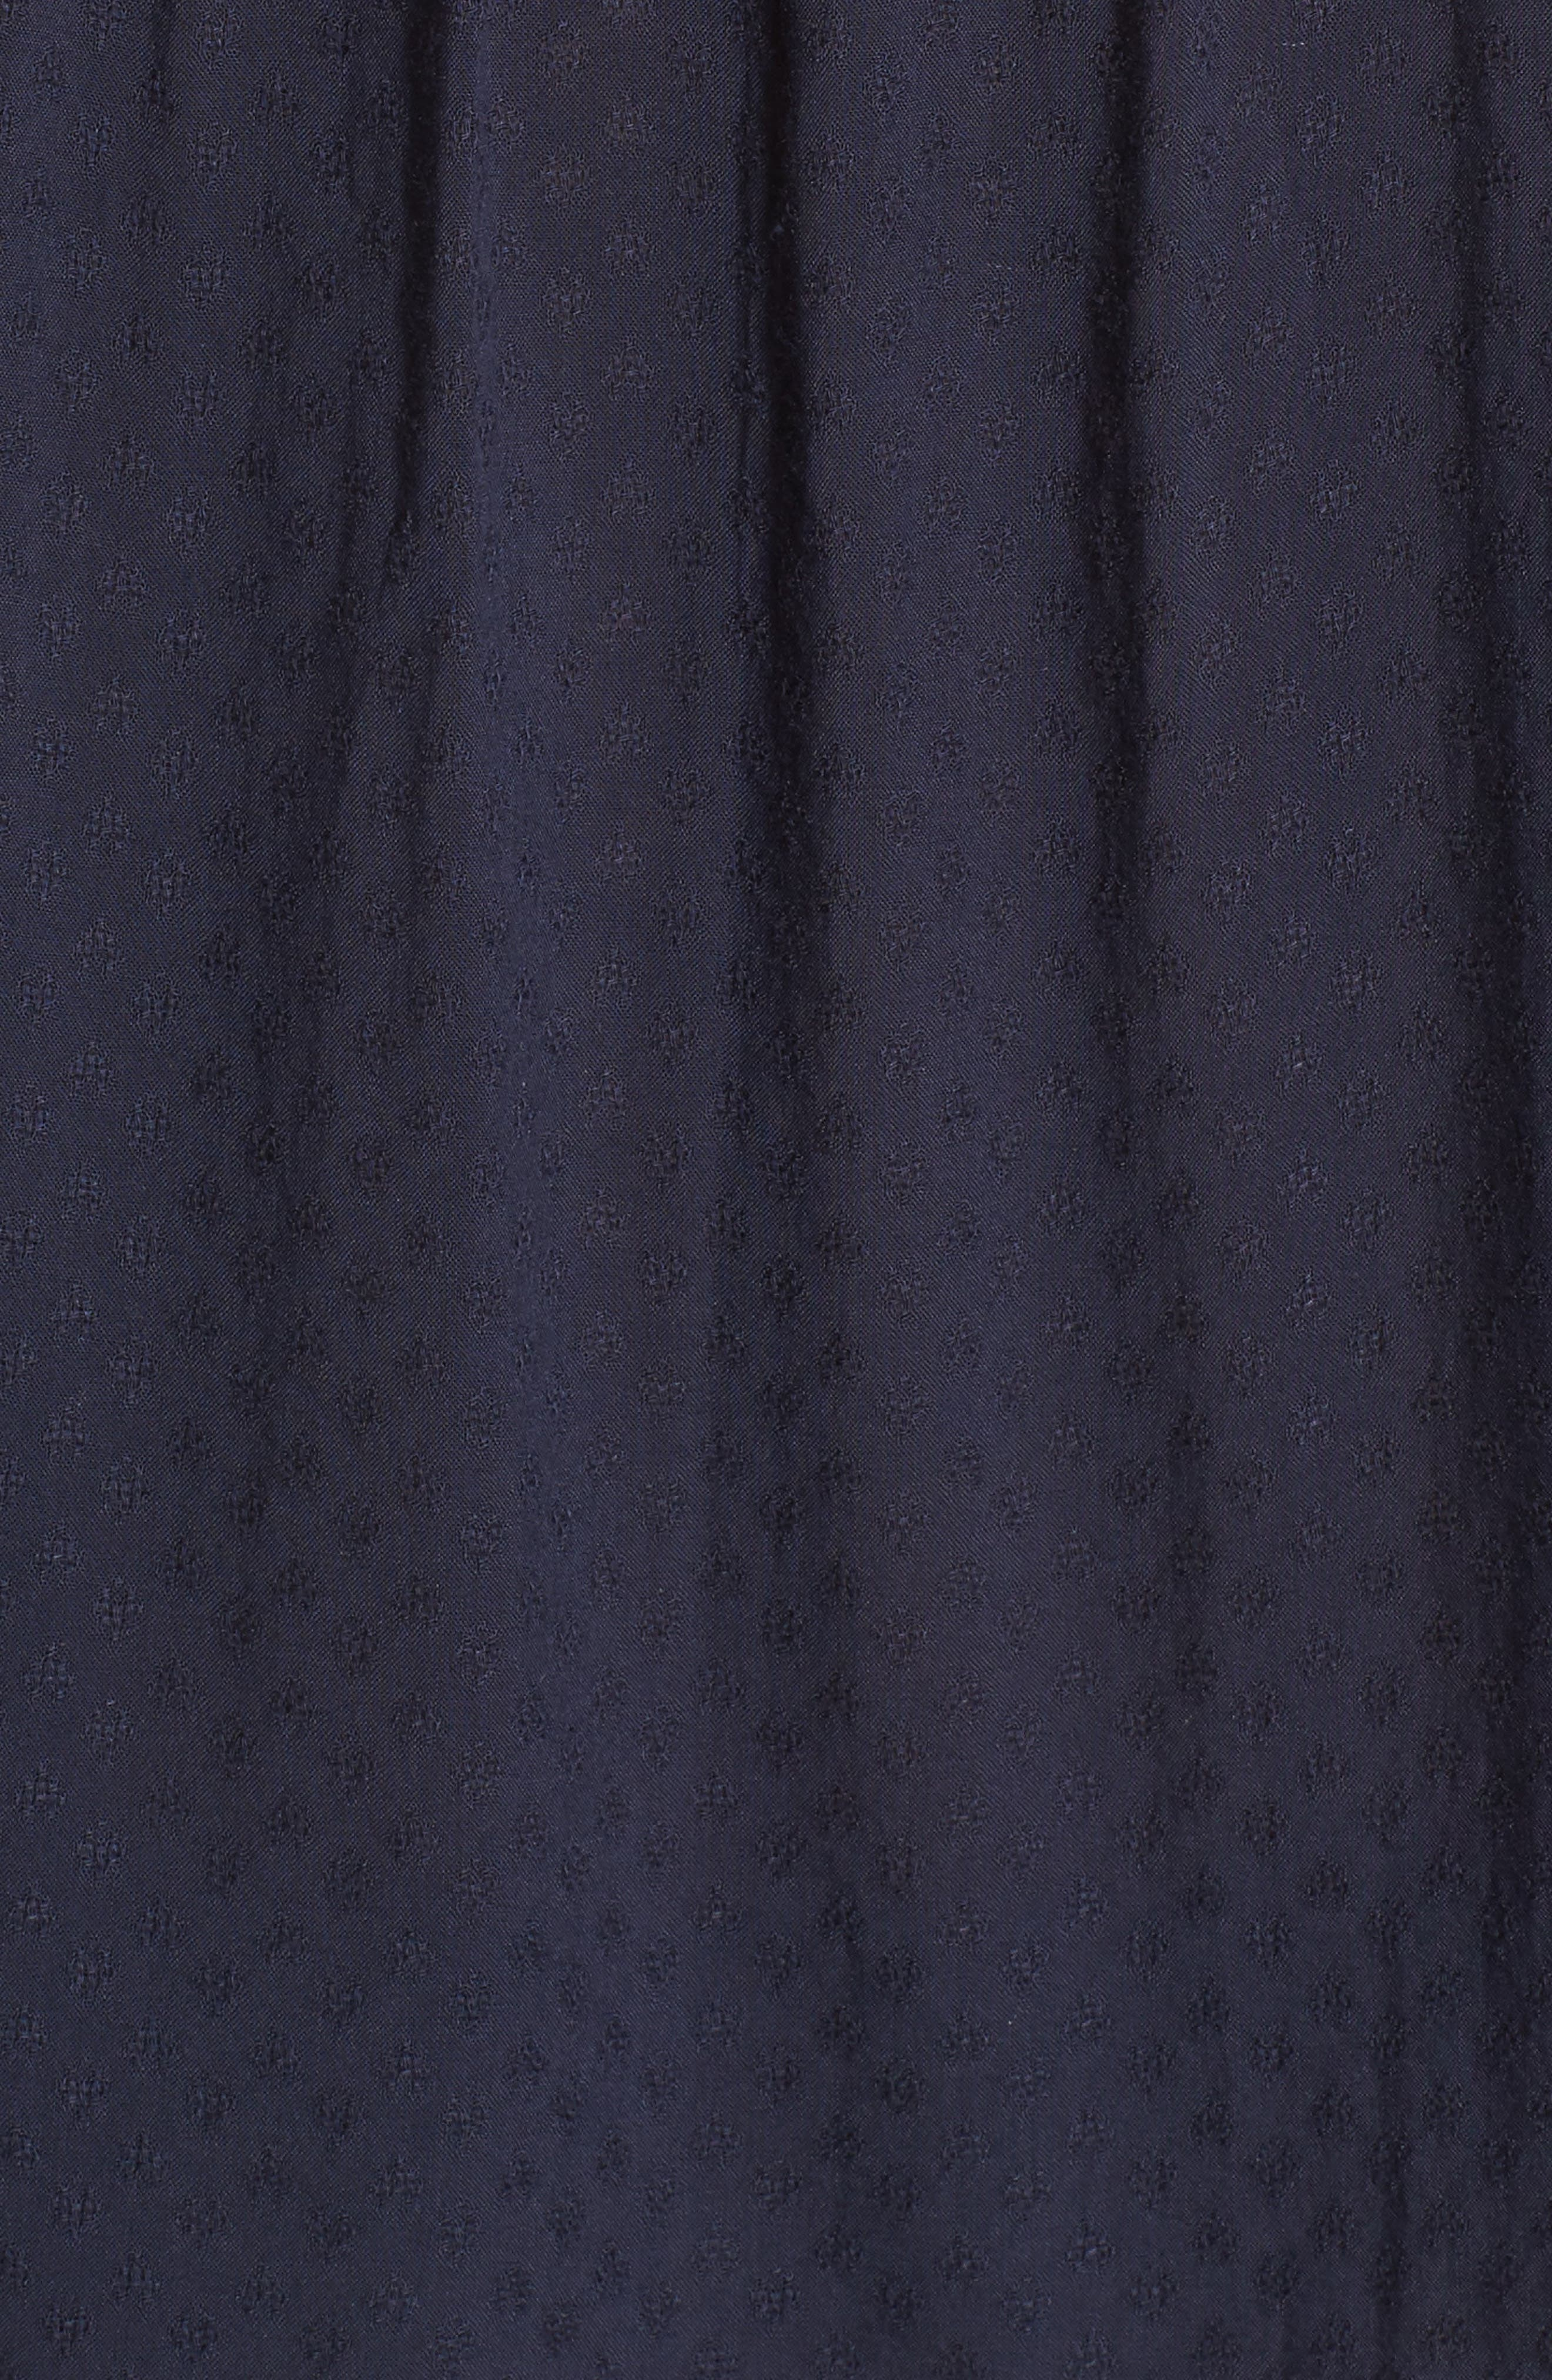 Lace Yoke Top,                             Alternate thumbnail 5, color,                             400